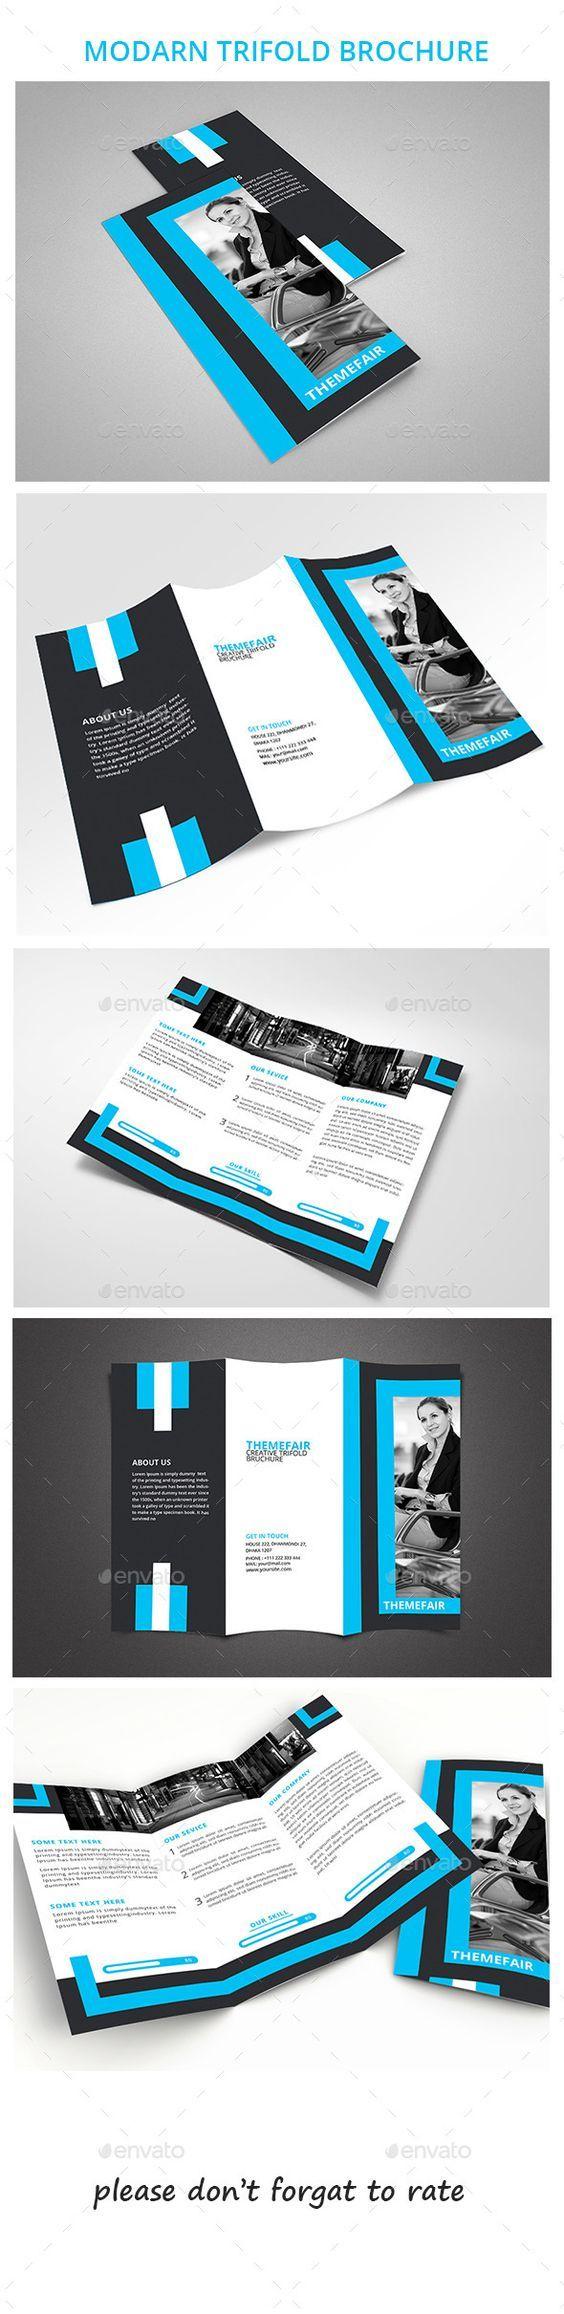 30 best Law Firm Brochure Design images on Pinterest | Brochure ...